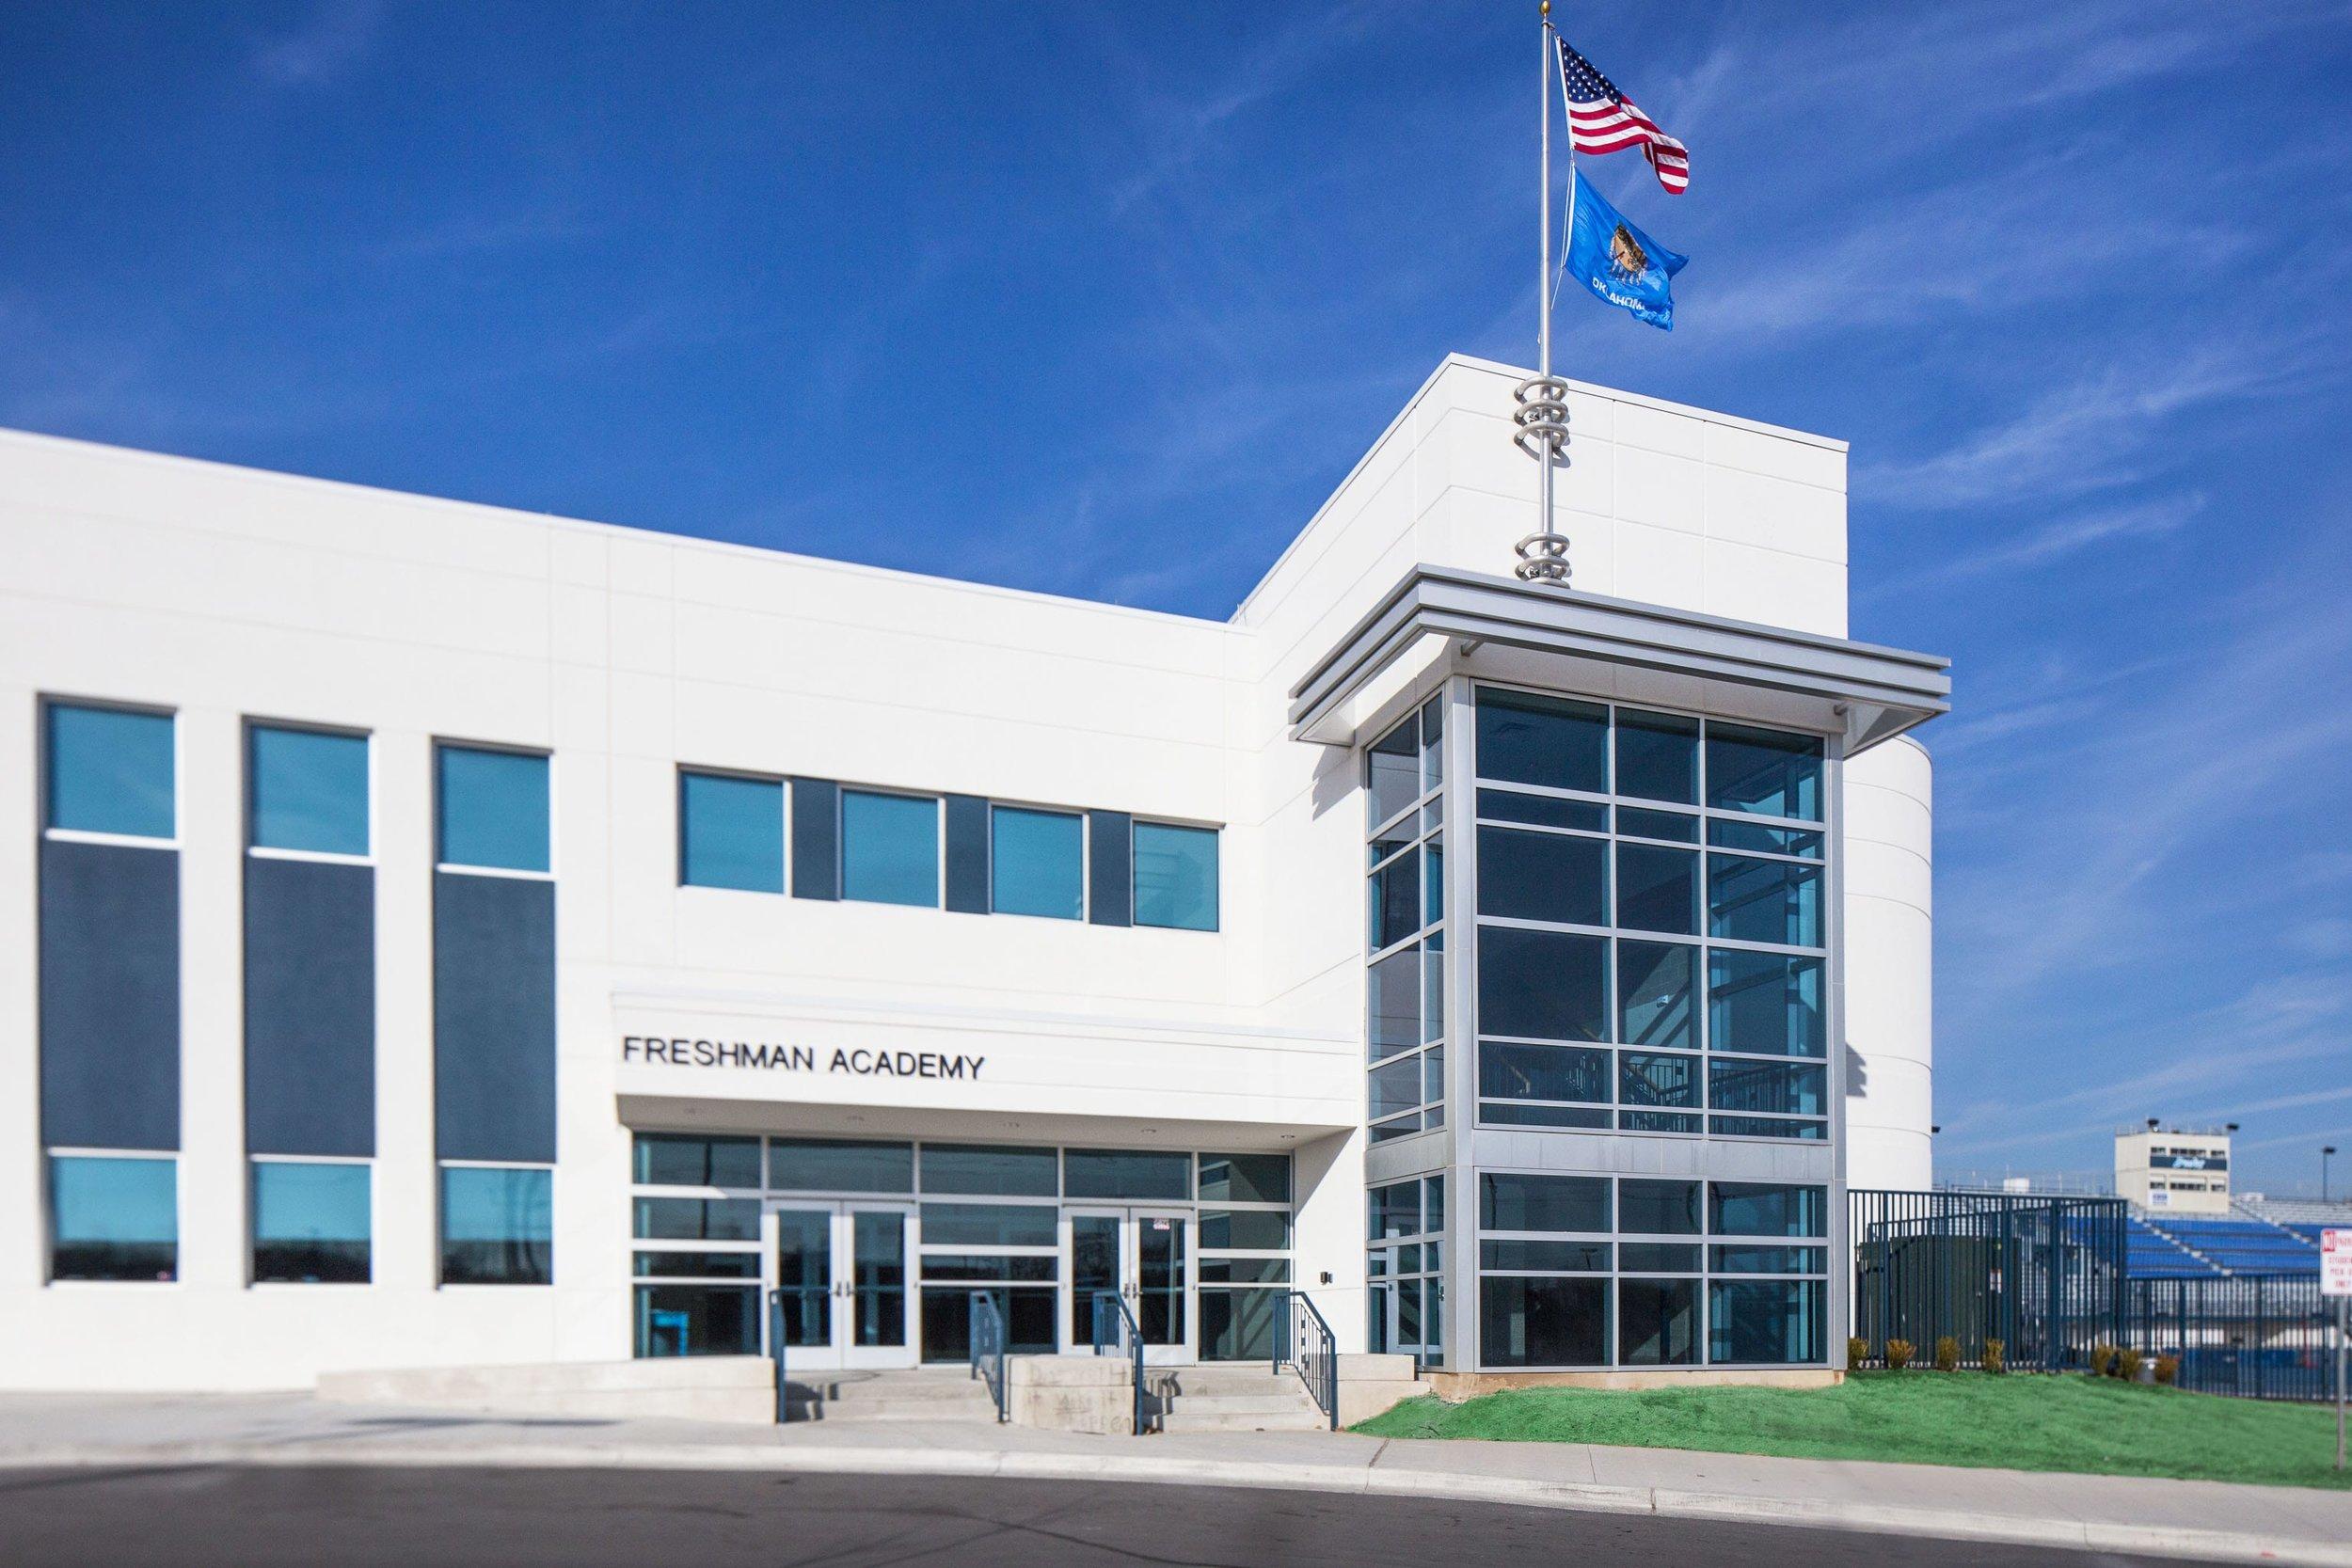 BPS - Freshman Academy